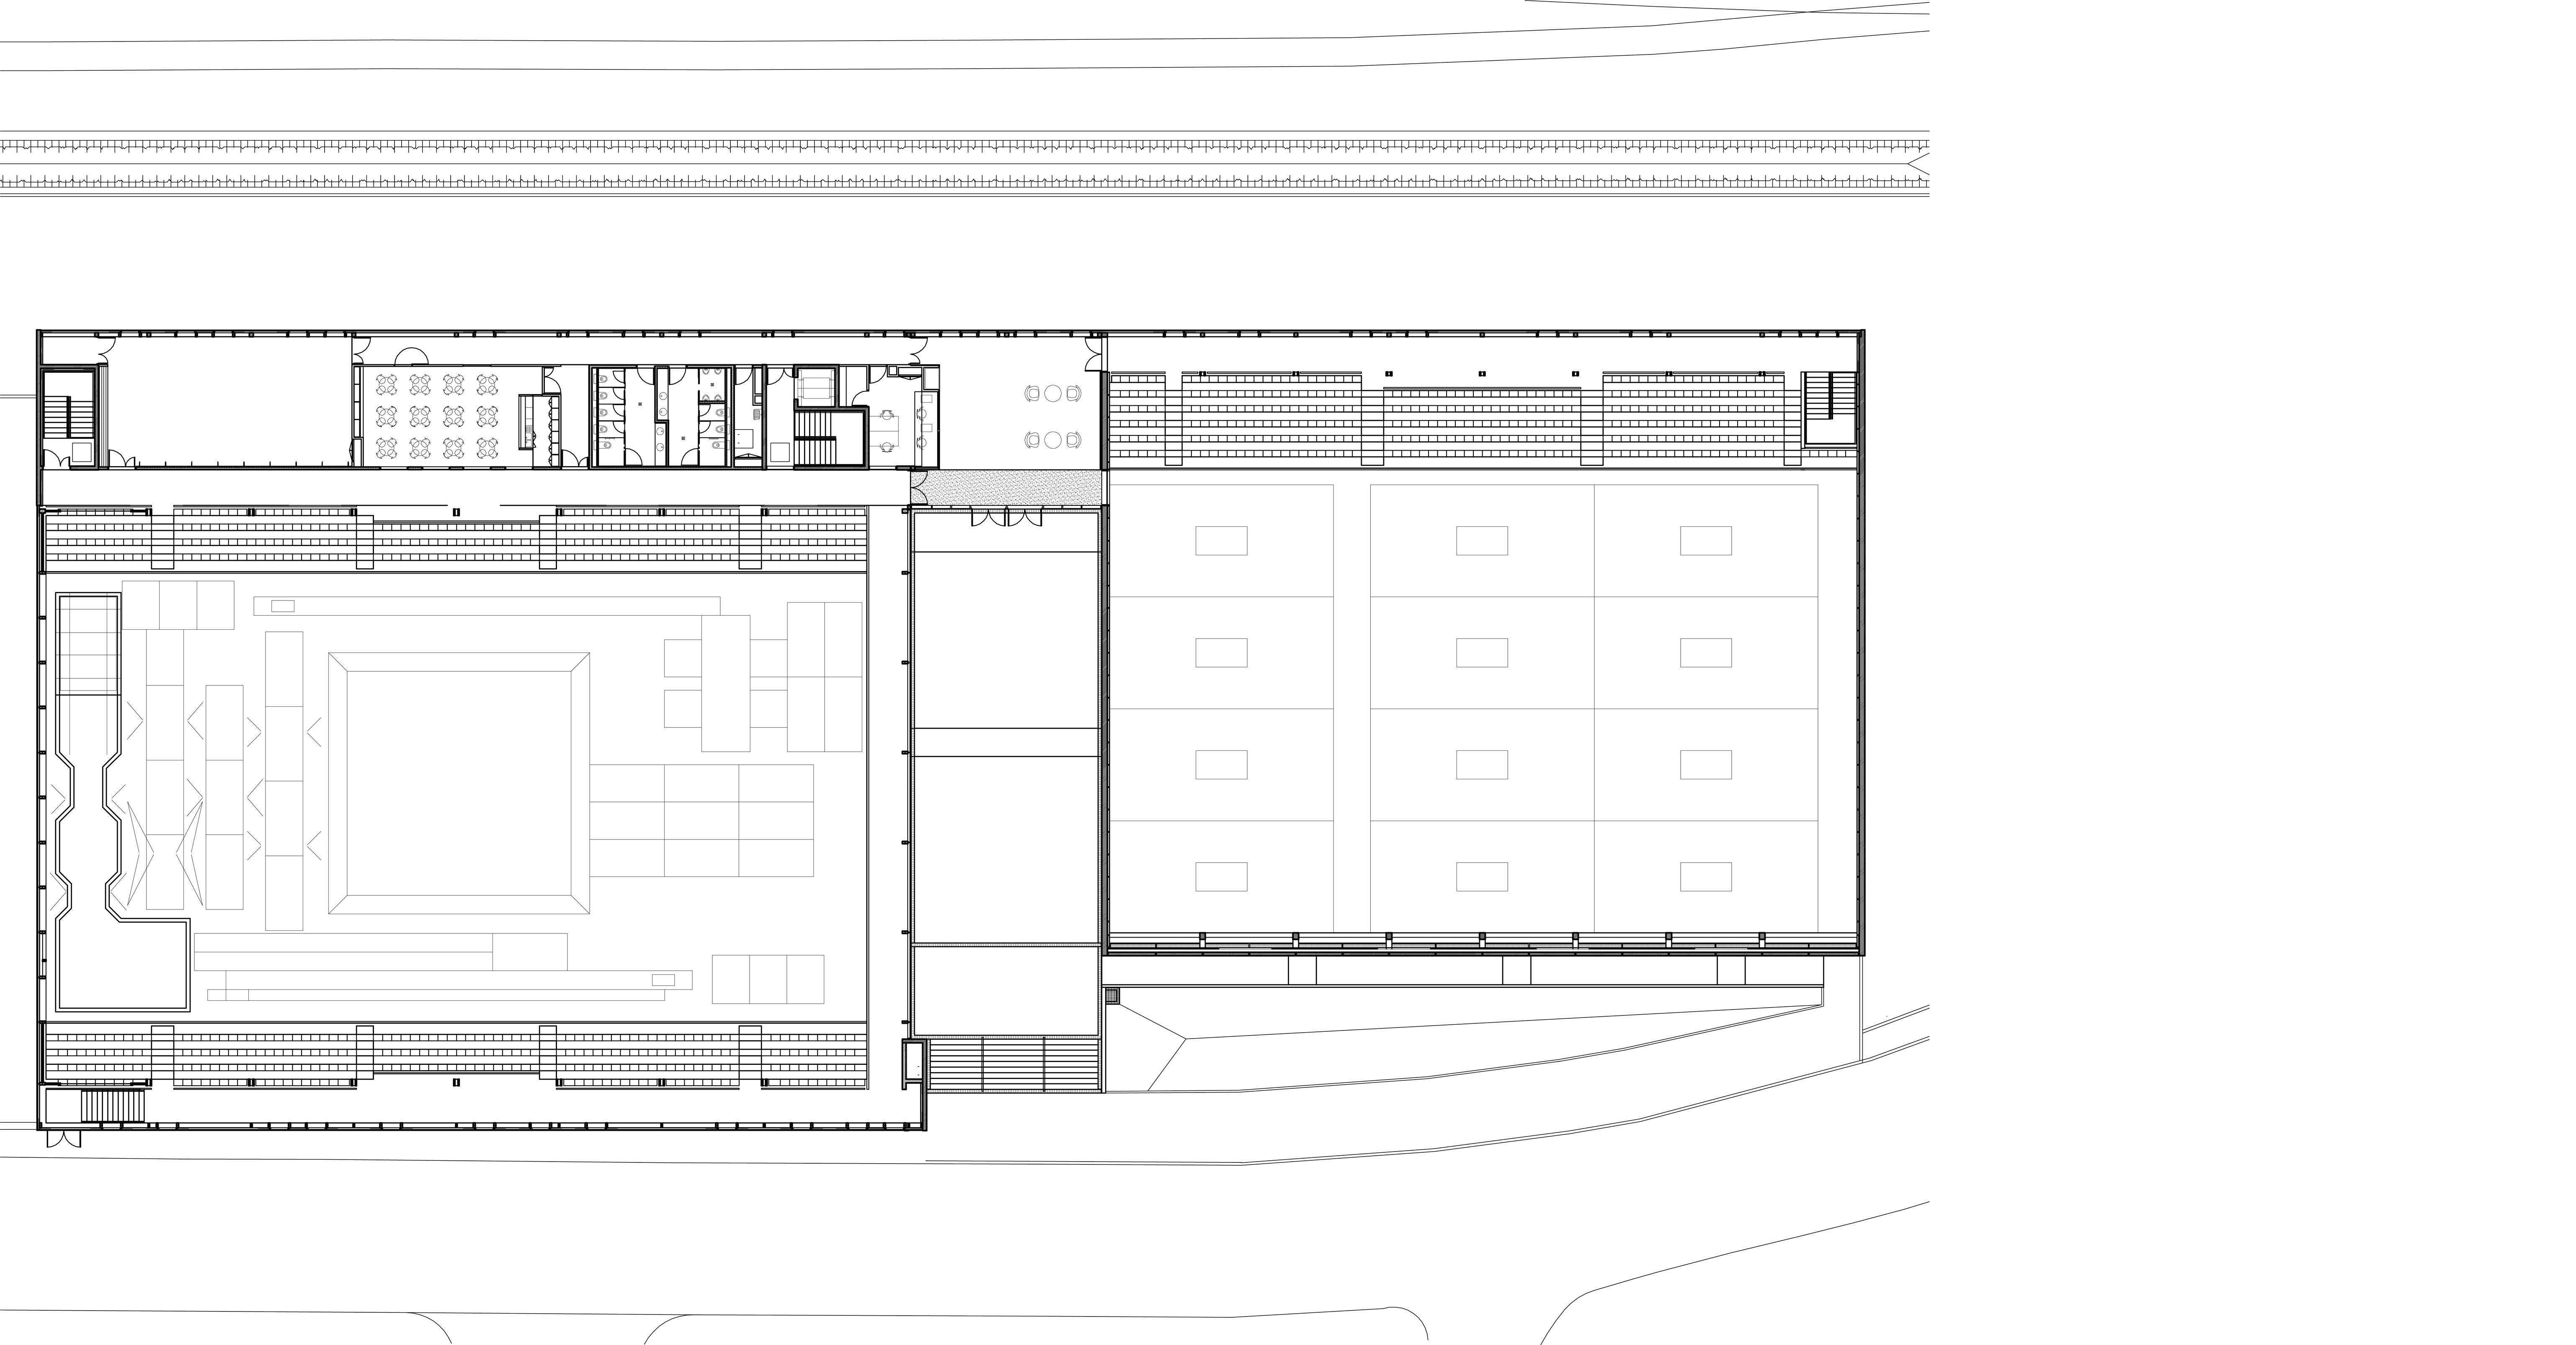 PLAN A - Salle de gymnastique et salle de tennis de table – Alençon